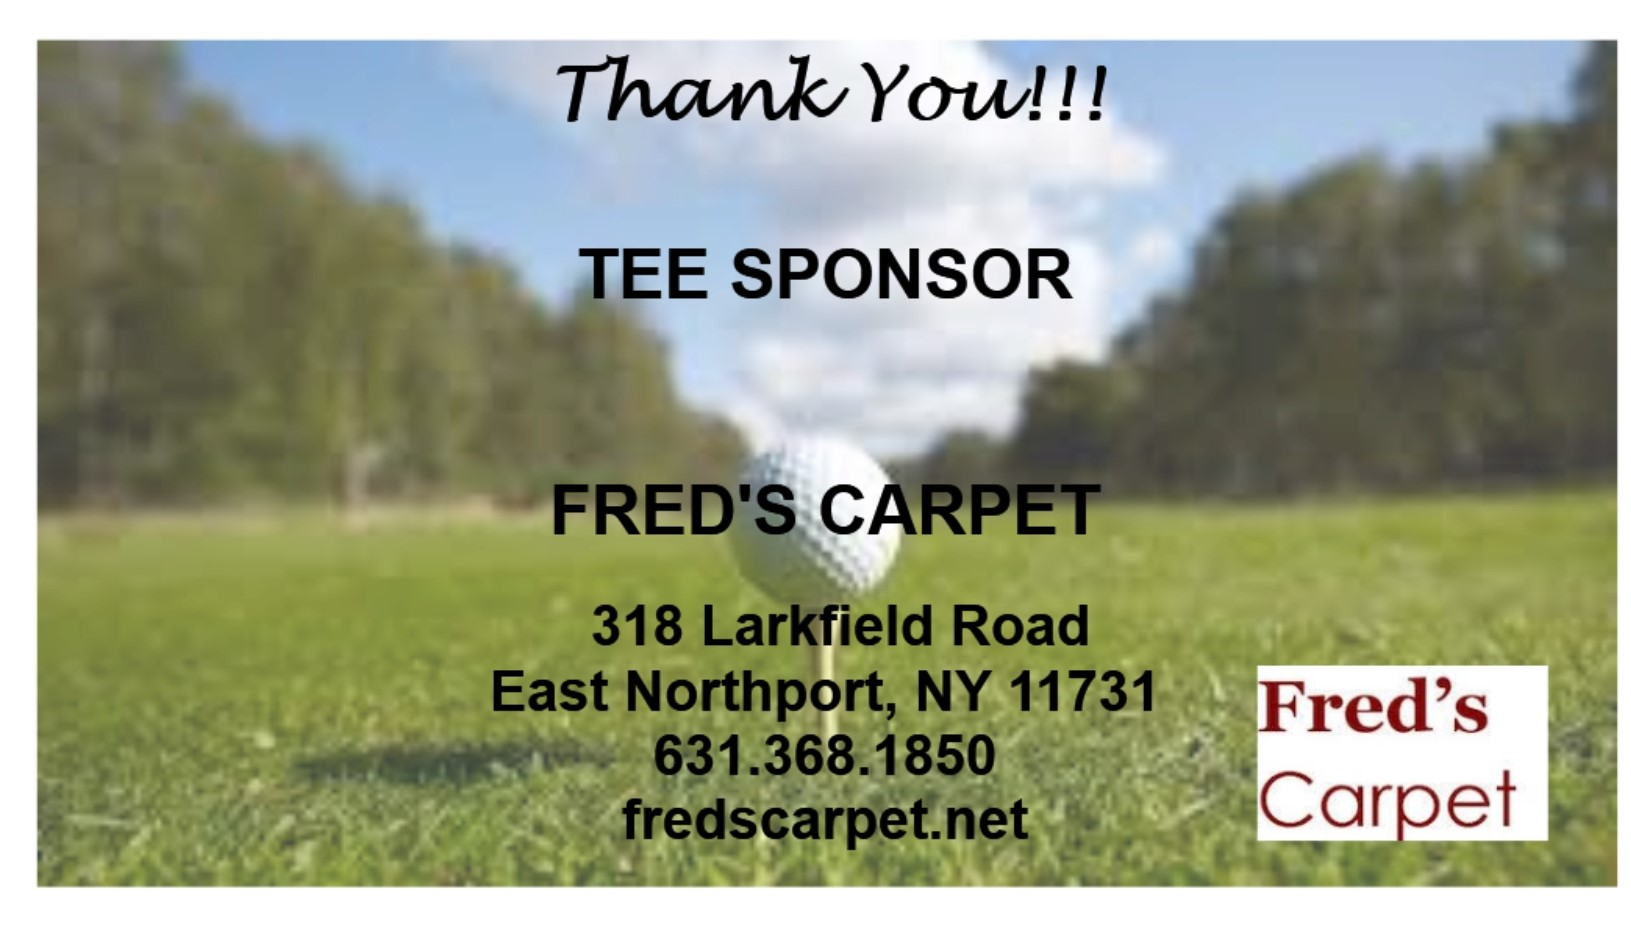 Fred's Carpet